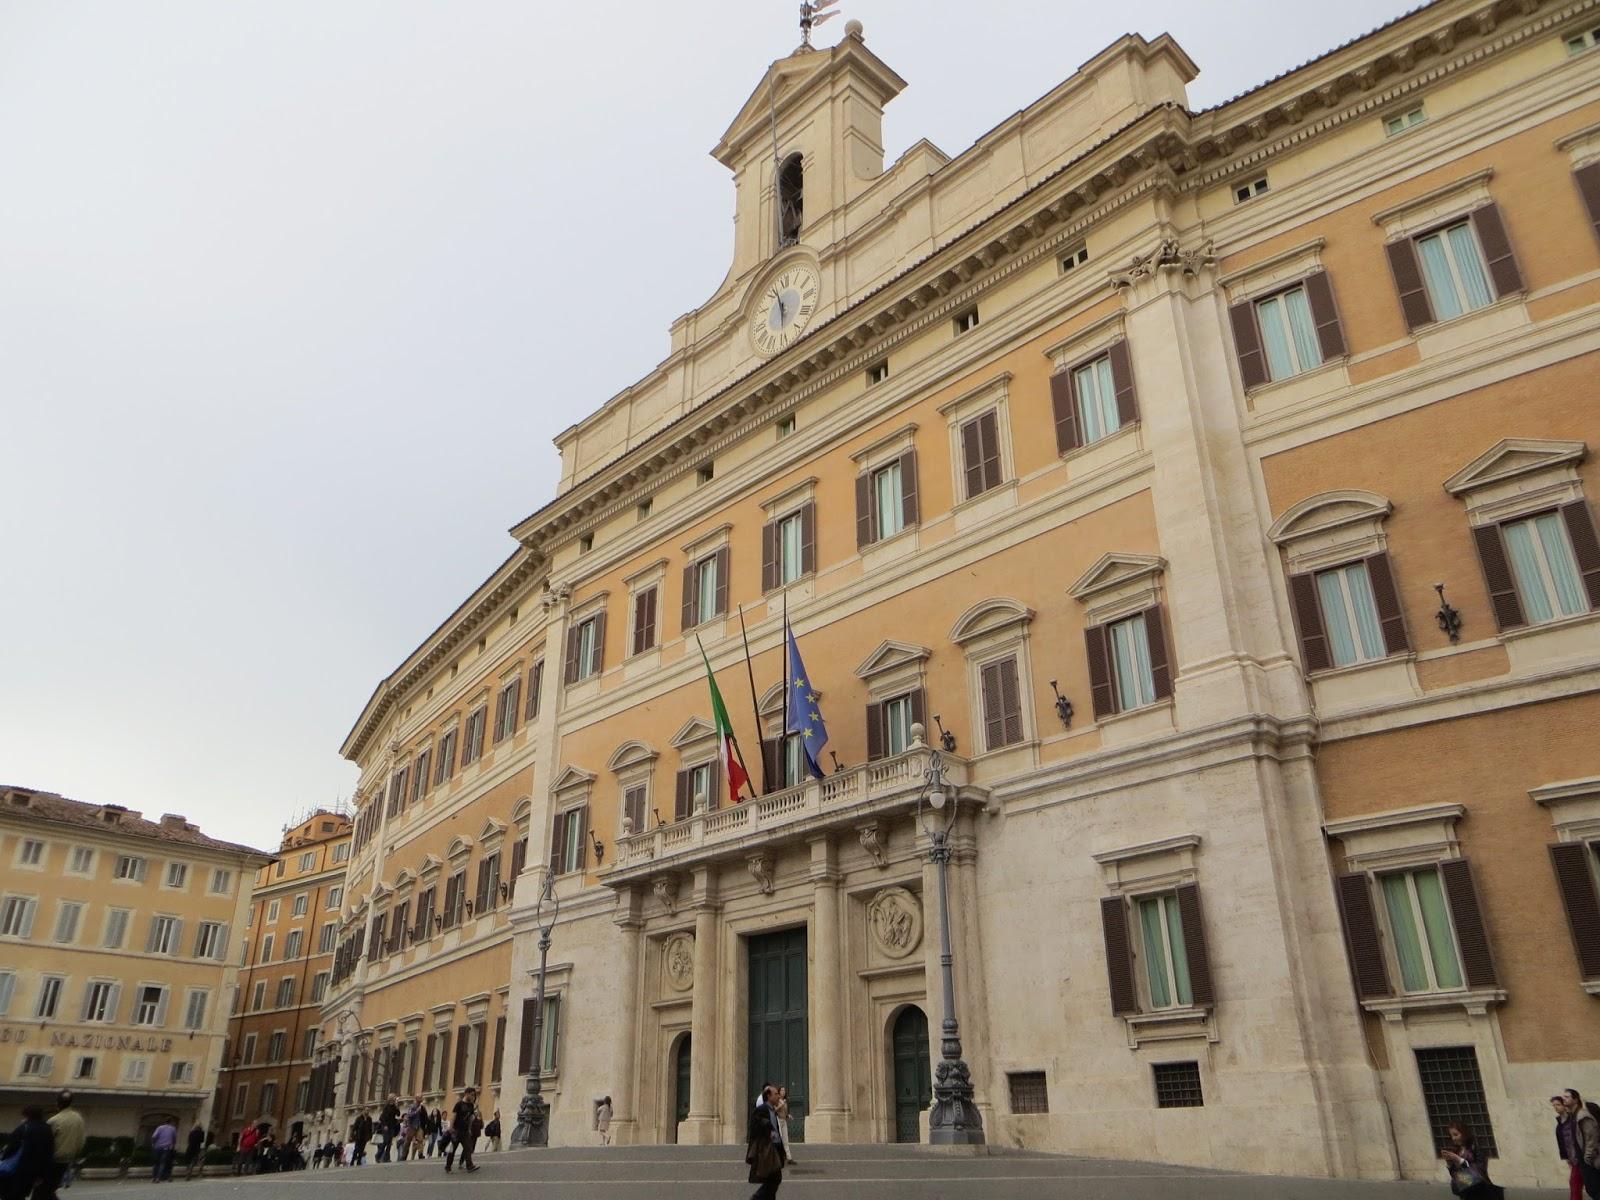 Franco brugnola posta la fiducia oggi sul d l for Camera deputati roma